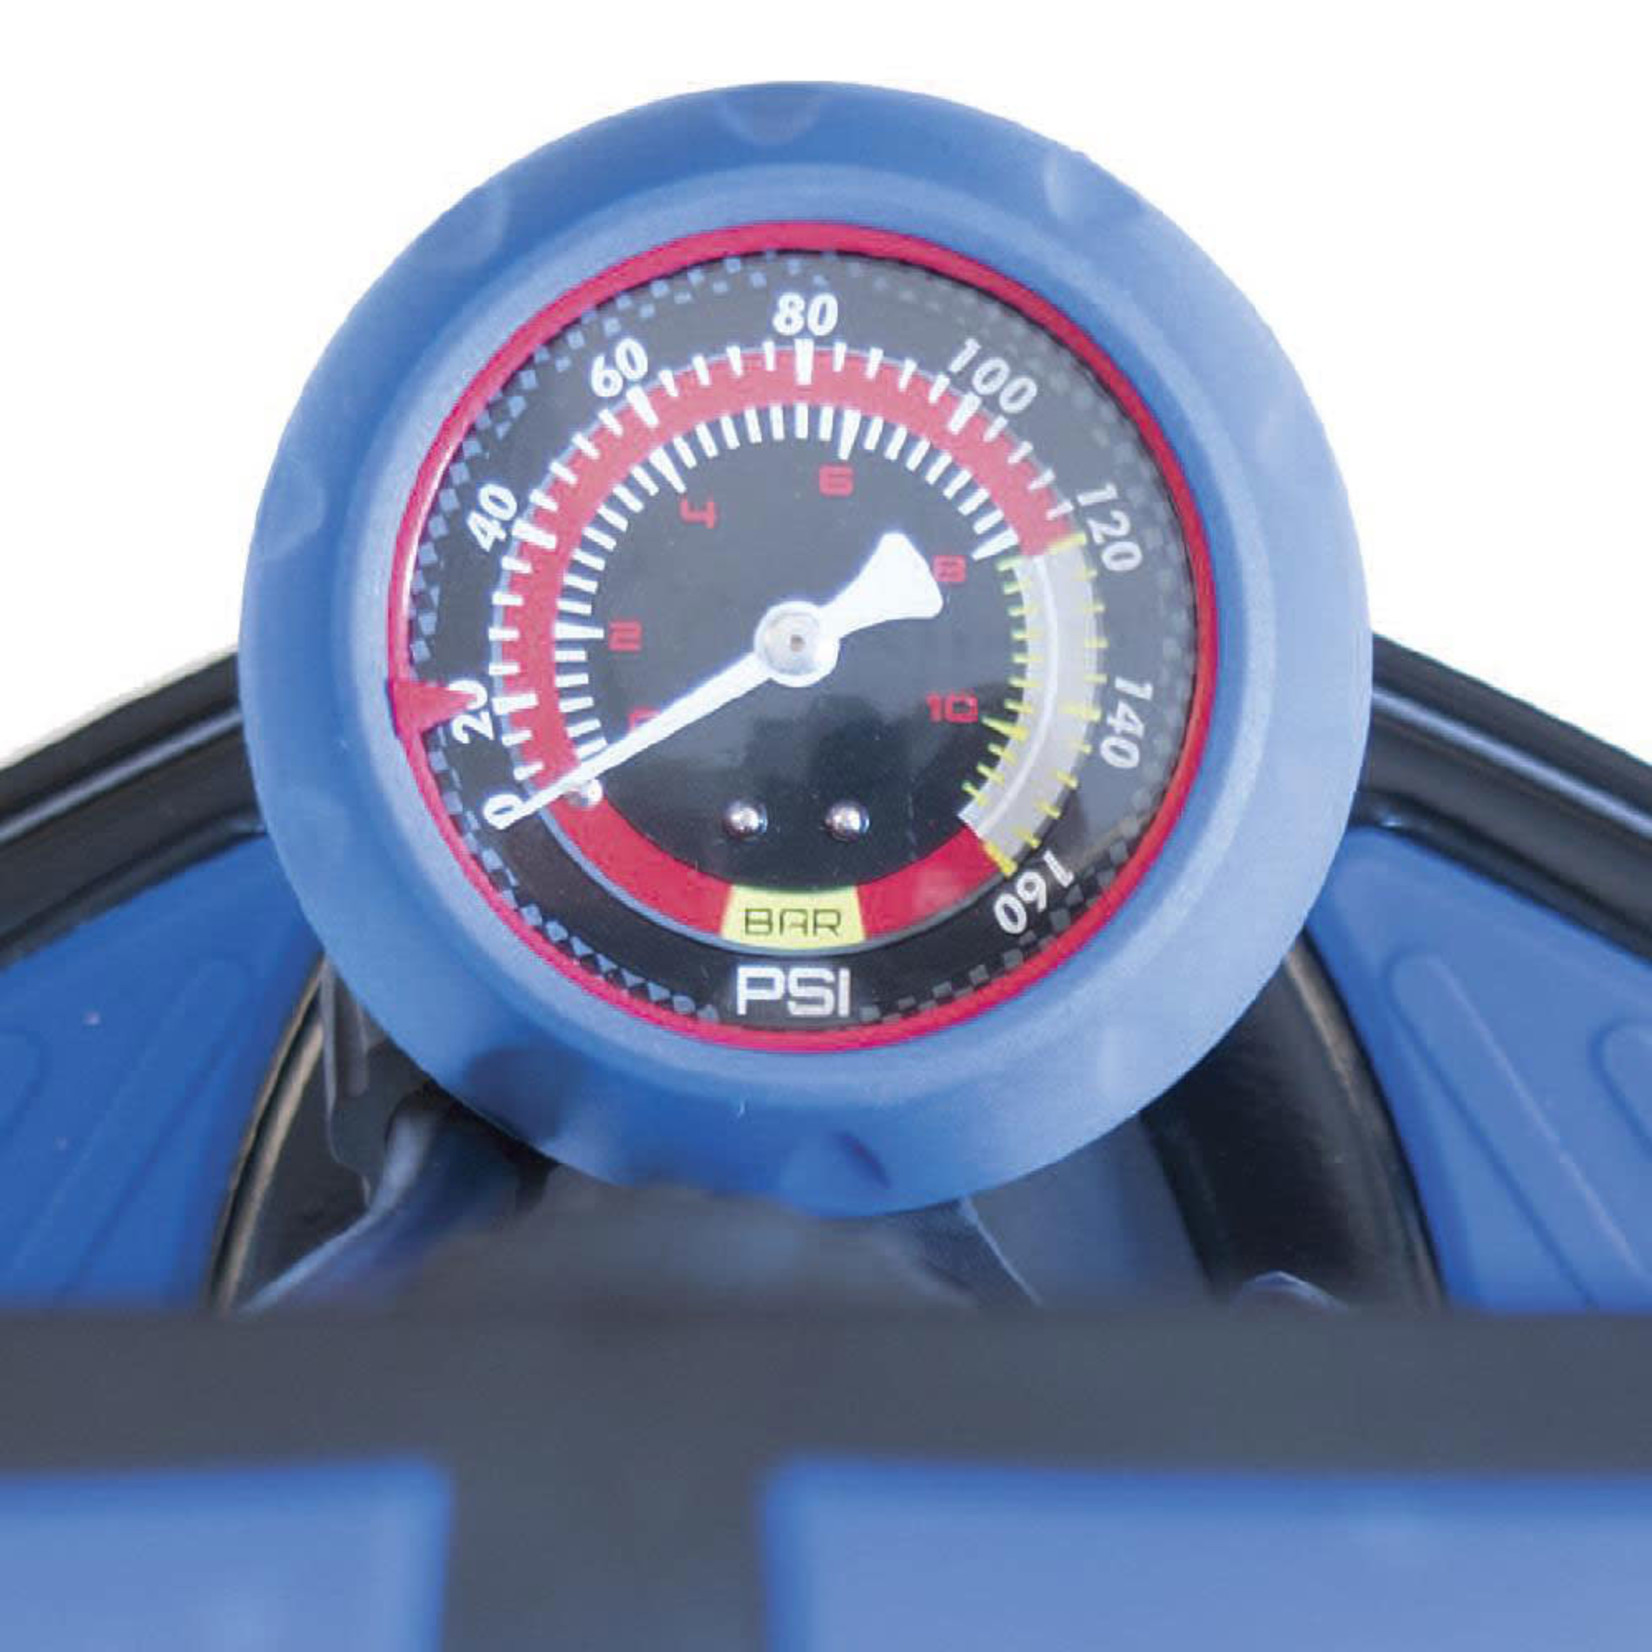 Azur Floor Pump SP45 Alloy Black/Blue